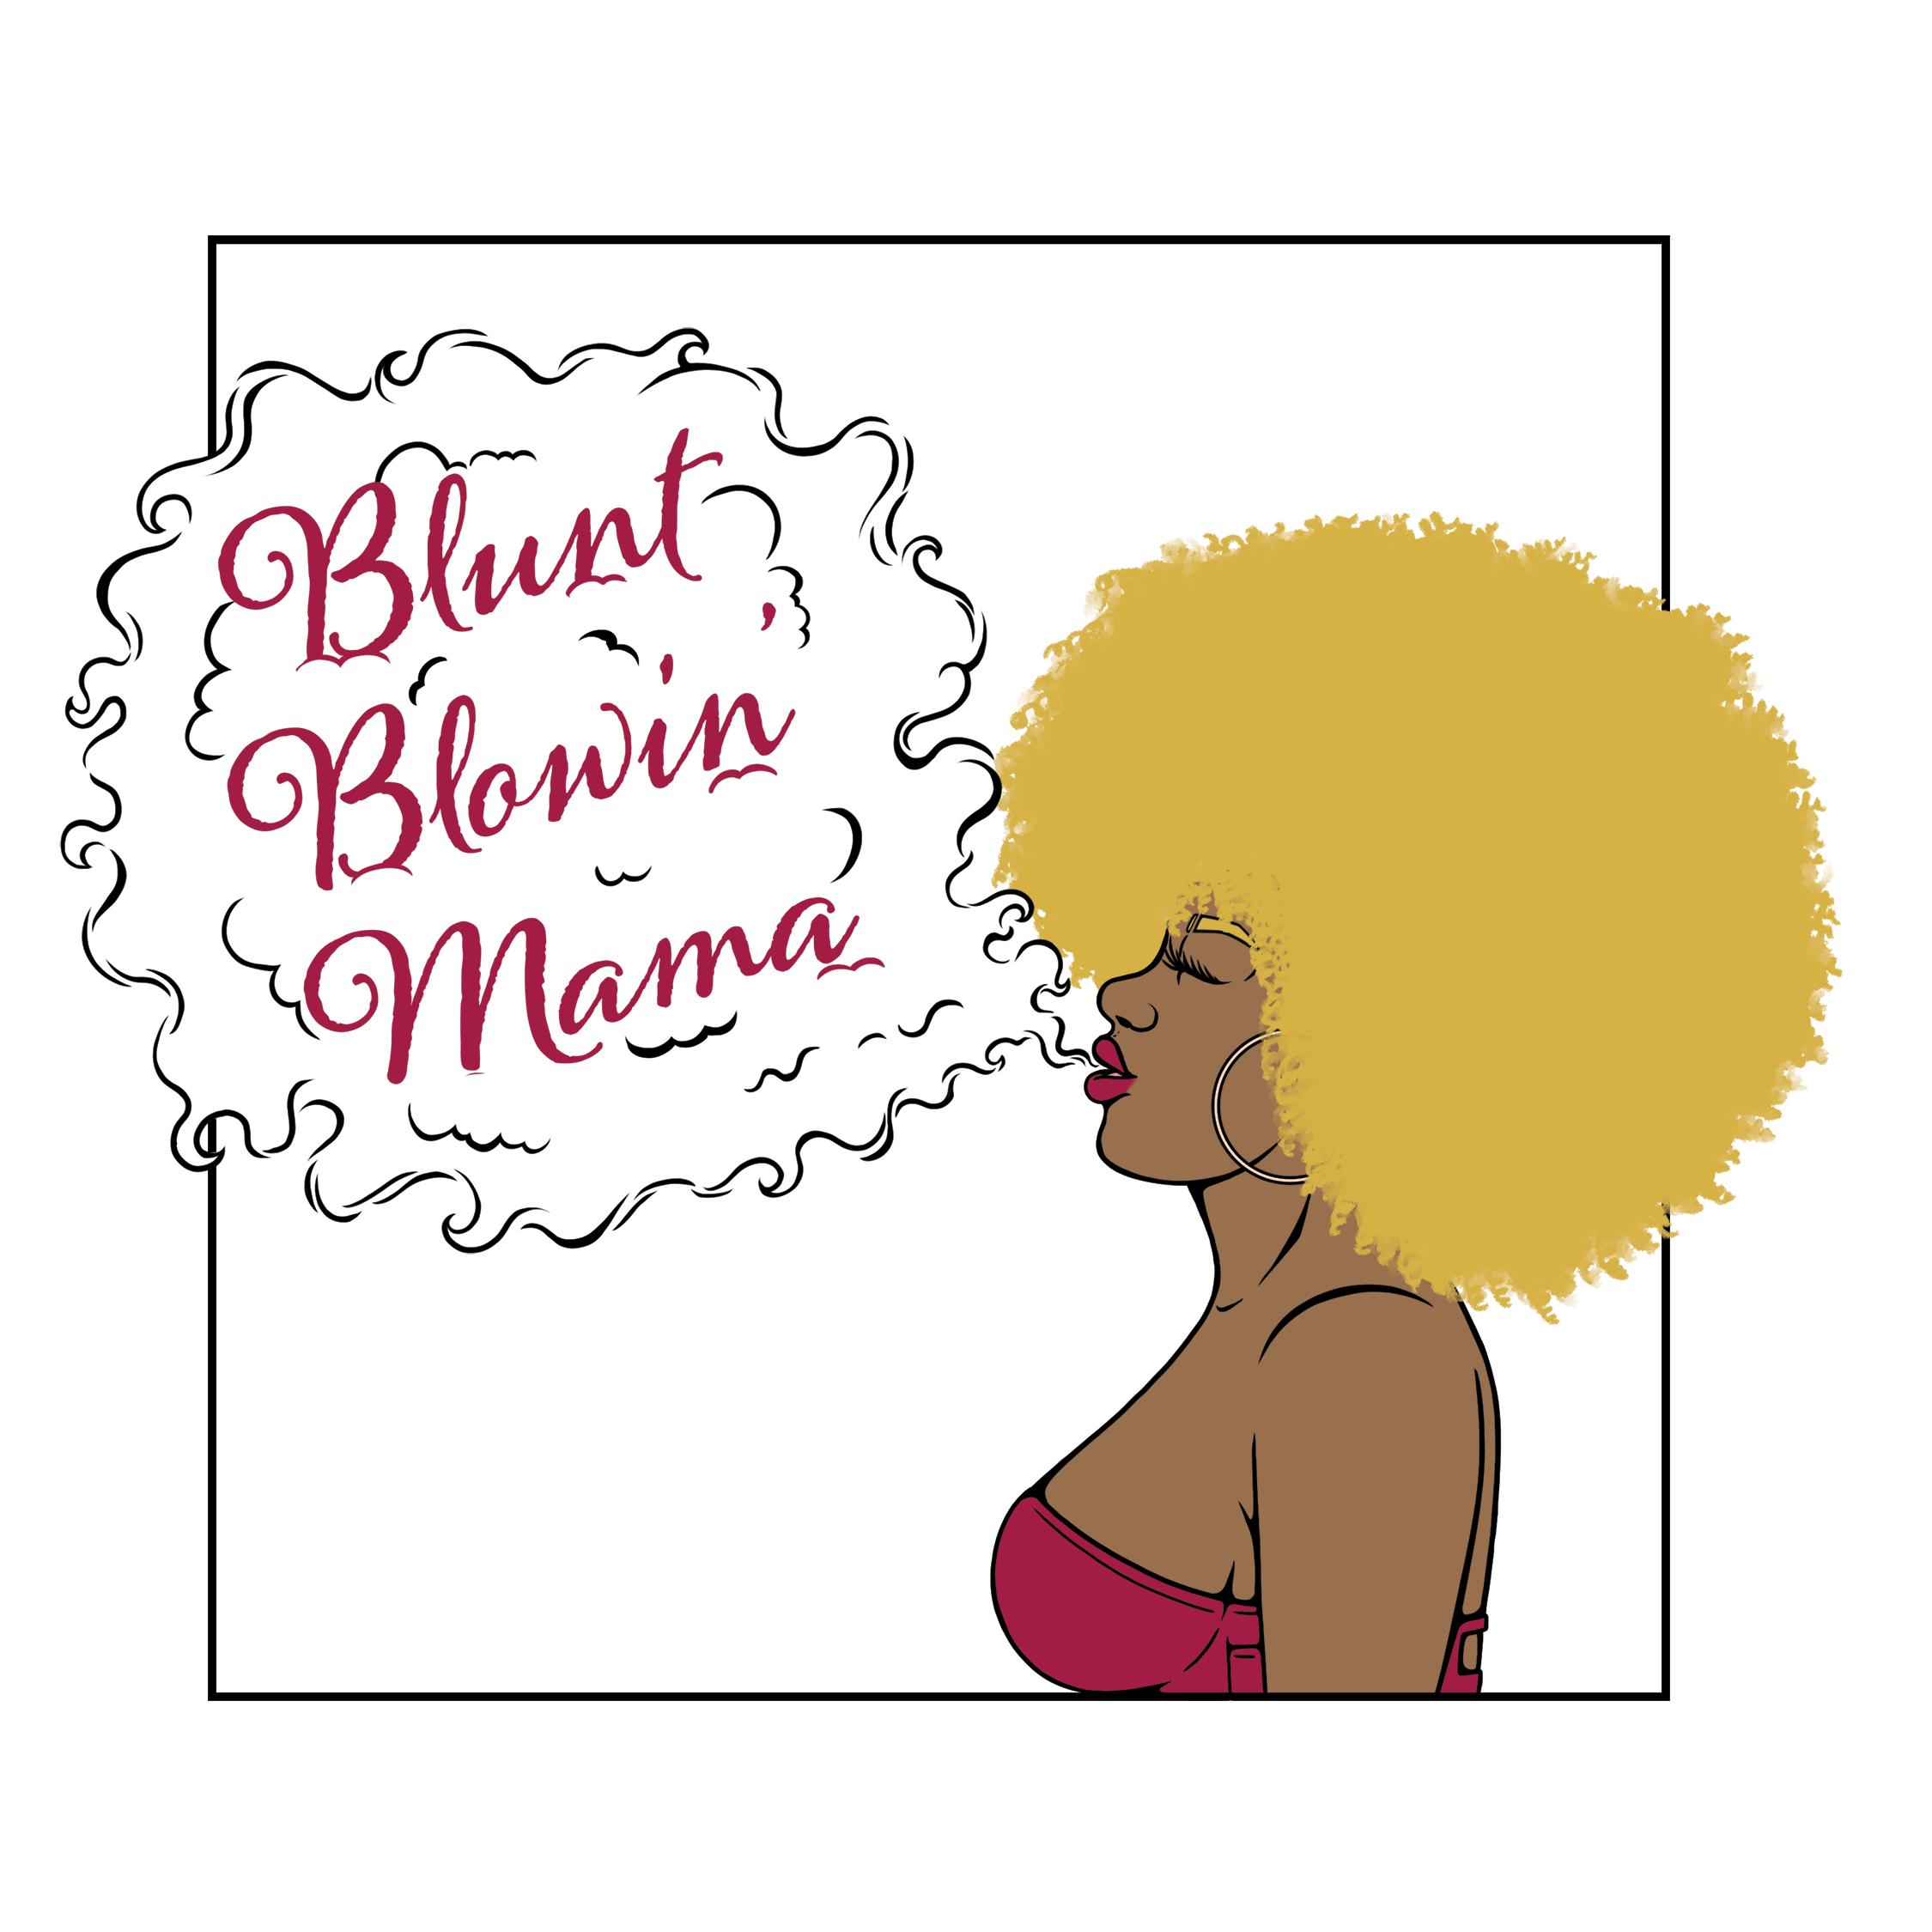 Blunt Blowin' Mama - Apple Podcast show art